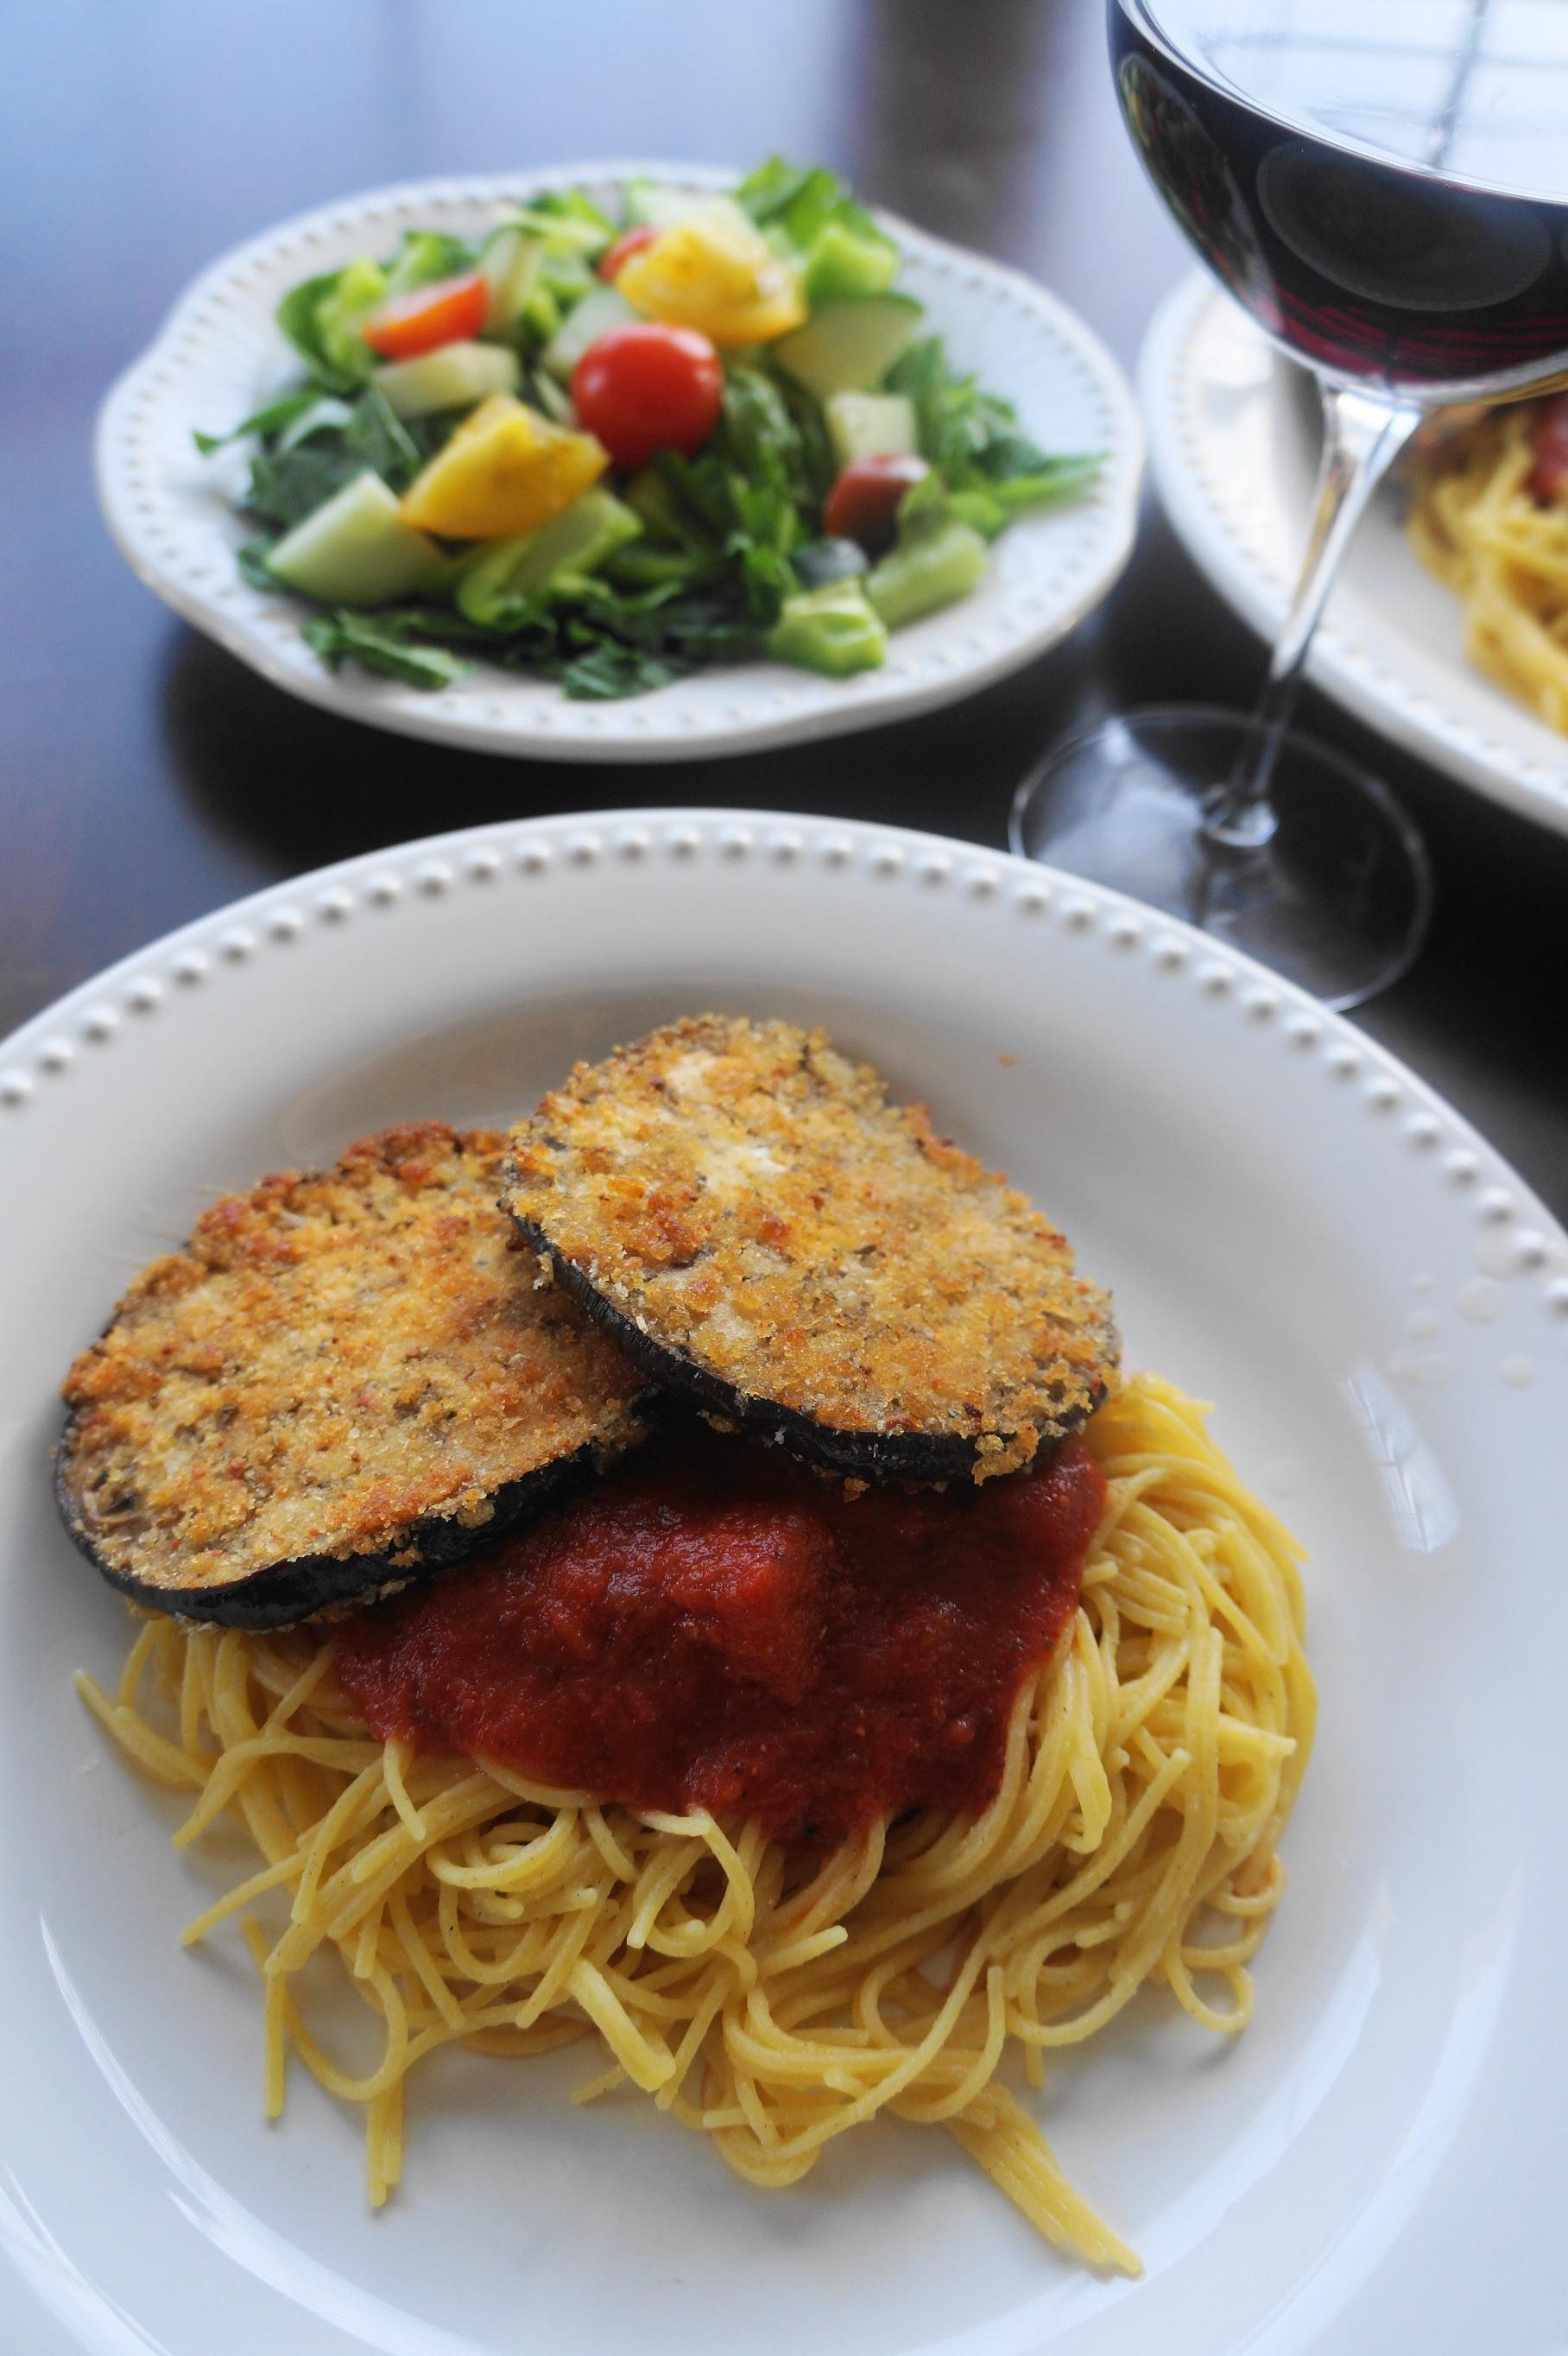 Healthy Eggplant Parmesan  Vegan or not Eggplant Parmesan V Busy Girl Healthy World